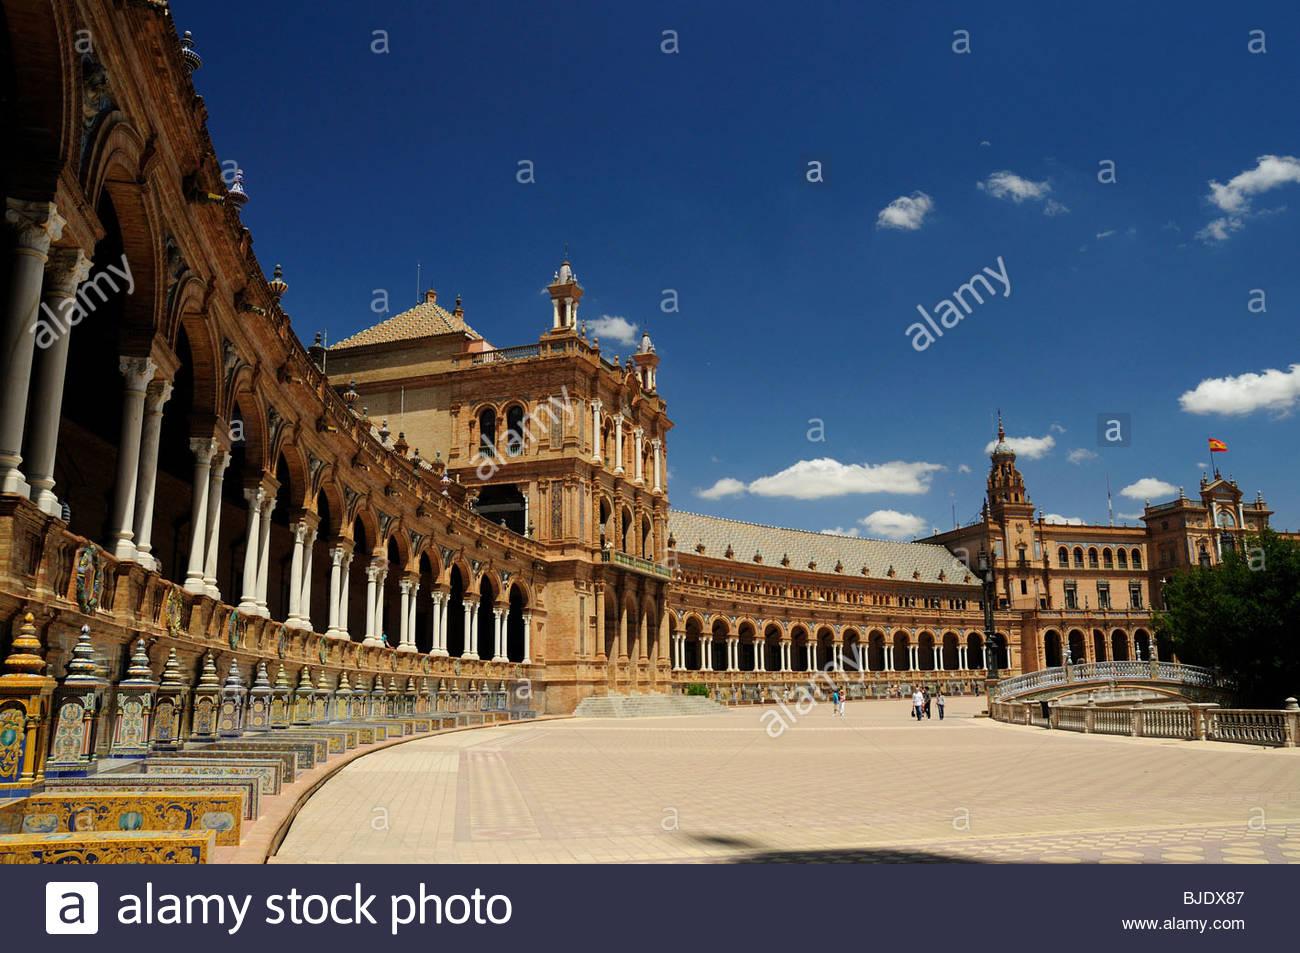 The Plaza de España, Spain, with the main - Stock Image